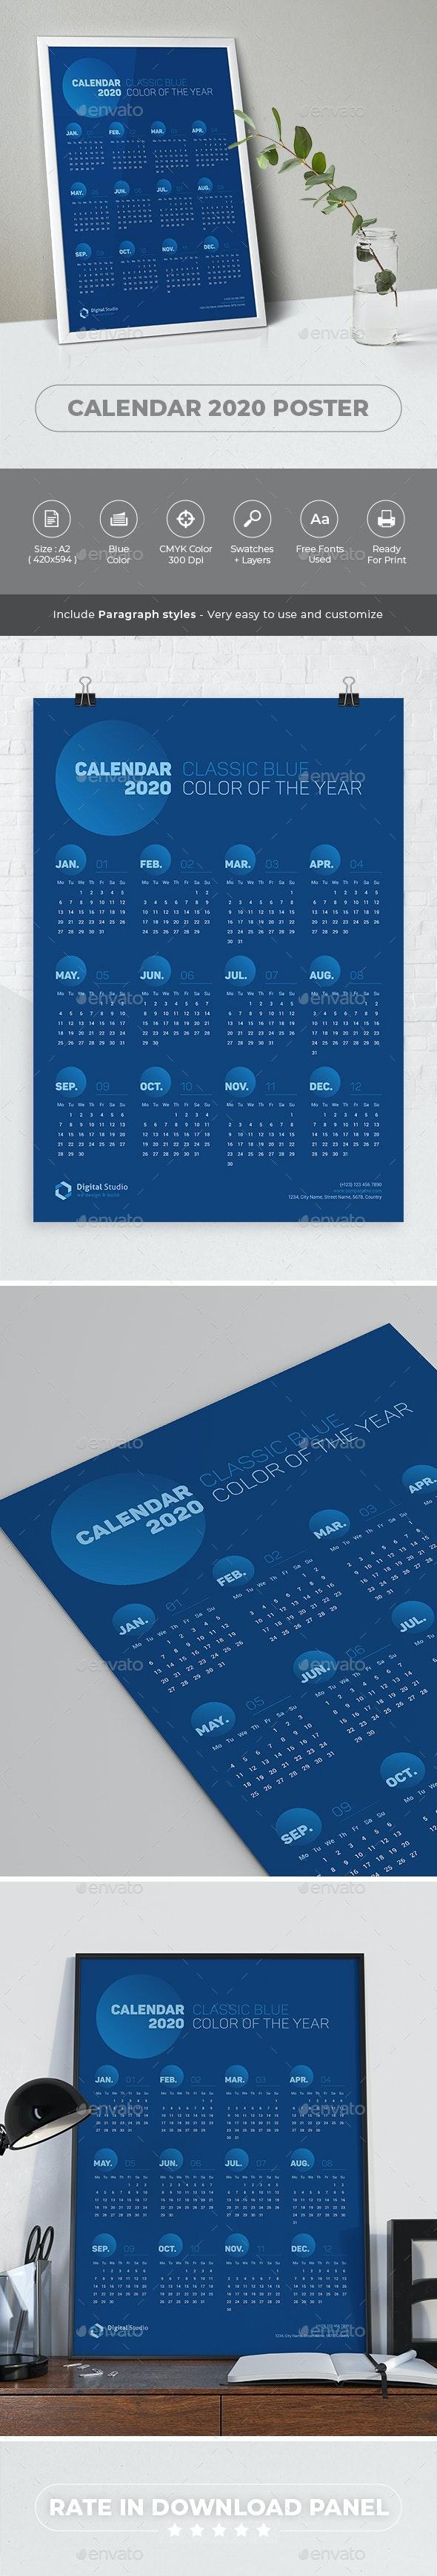 Calendar 2020 Poster - Calendars Stationery